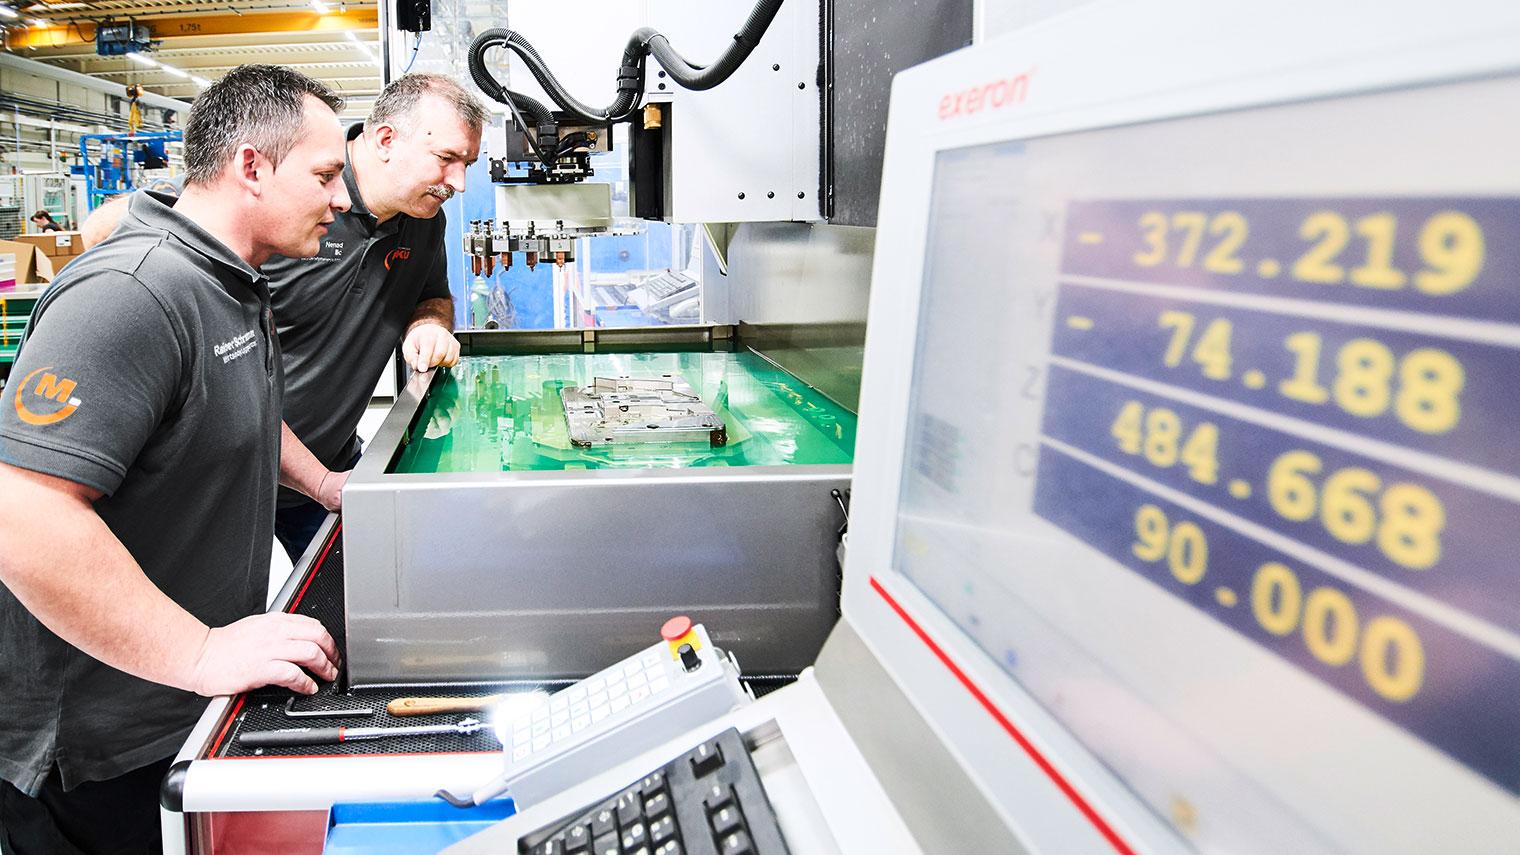 MEKU Kunststoffkompetenz Werkzeugbau